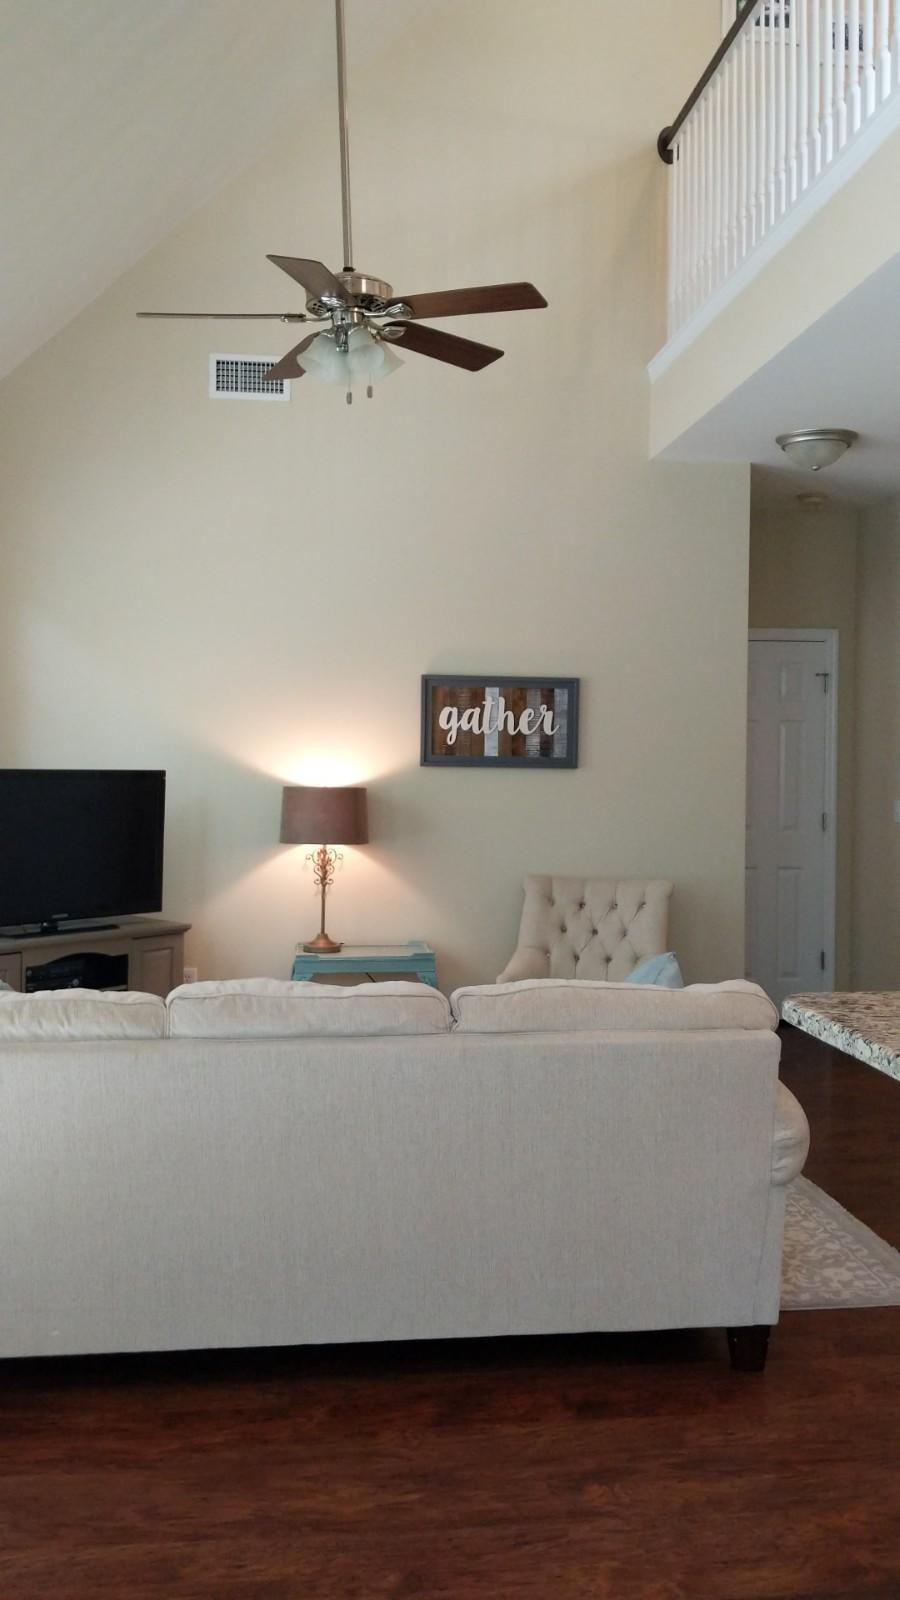 Park West Homes For Sale - 1337 Heidiho, Mount Pleasant, SC - 14